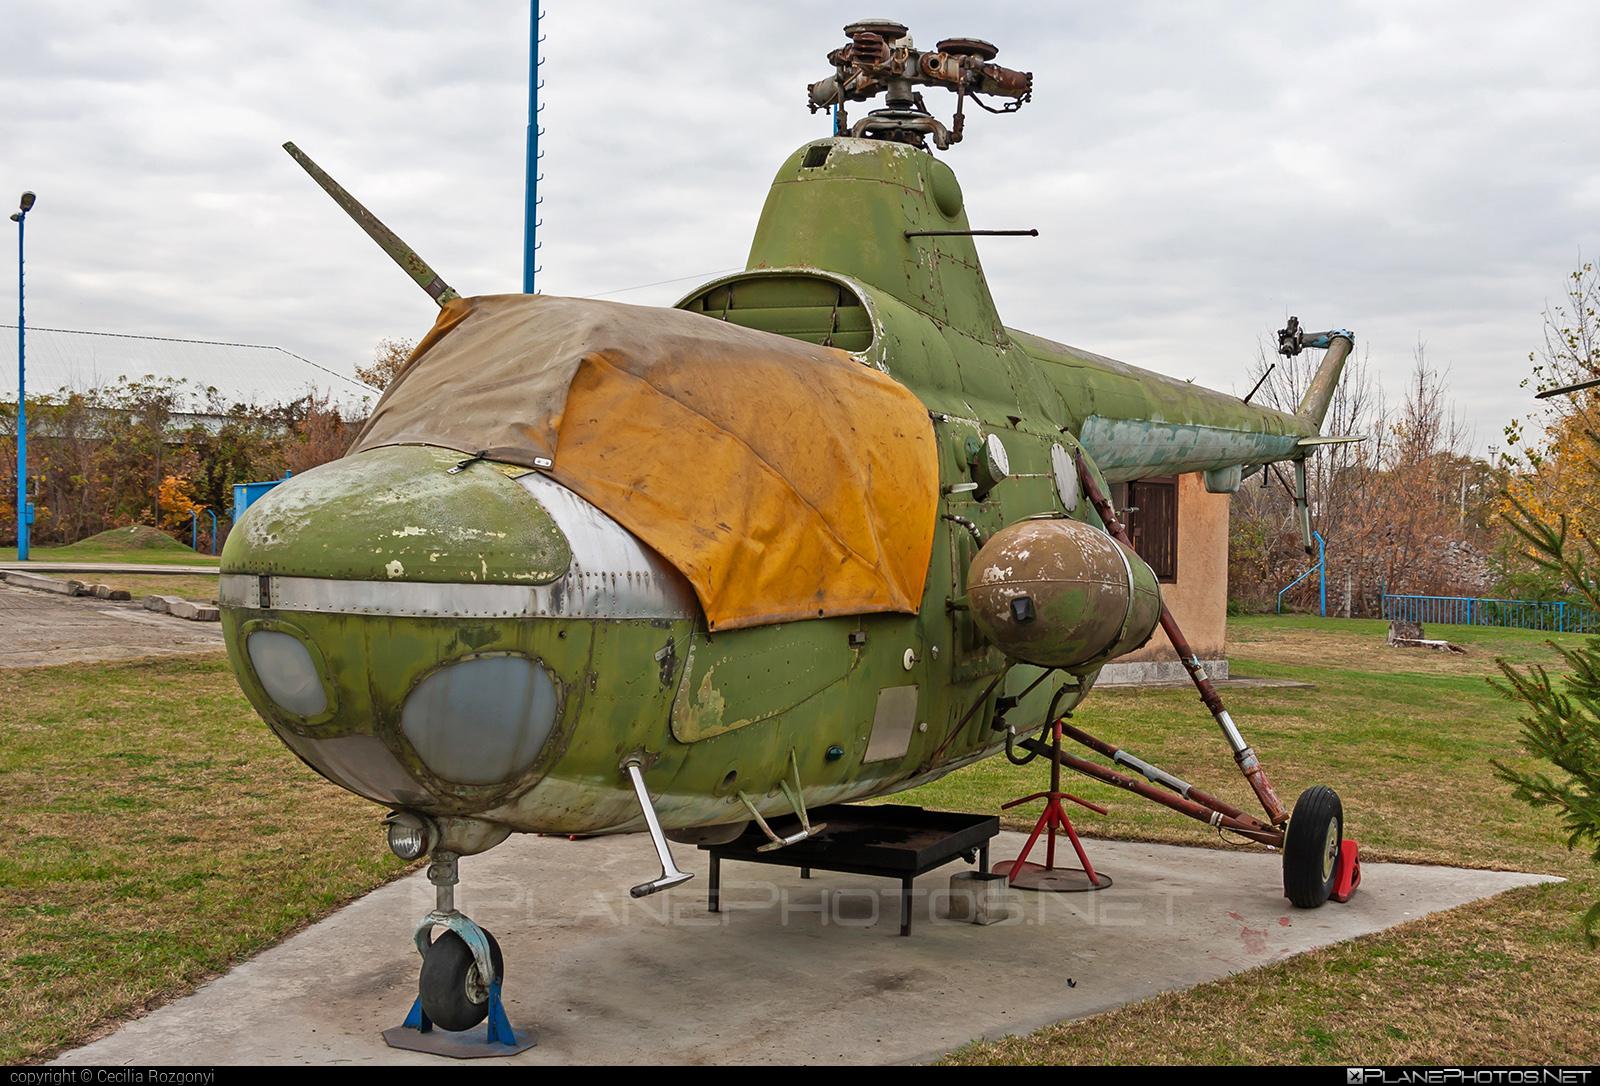 PZL-Świdnik SM-1 - 033 operated by Magyar Néphadsereg (Hungarian People's Army) #hungarianpeoplesarmy #magyarnephadsereg #pzl #pzlswidnik